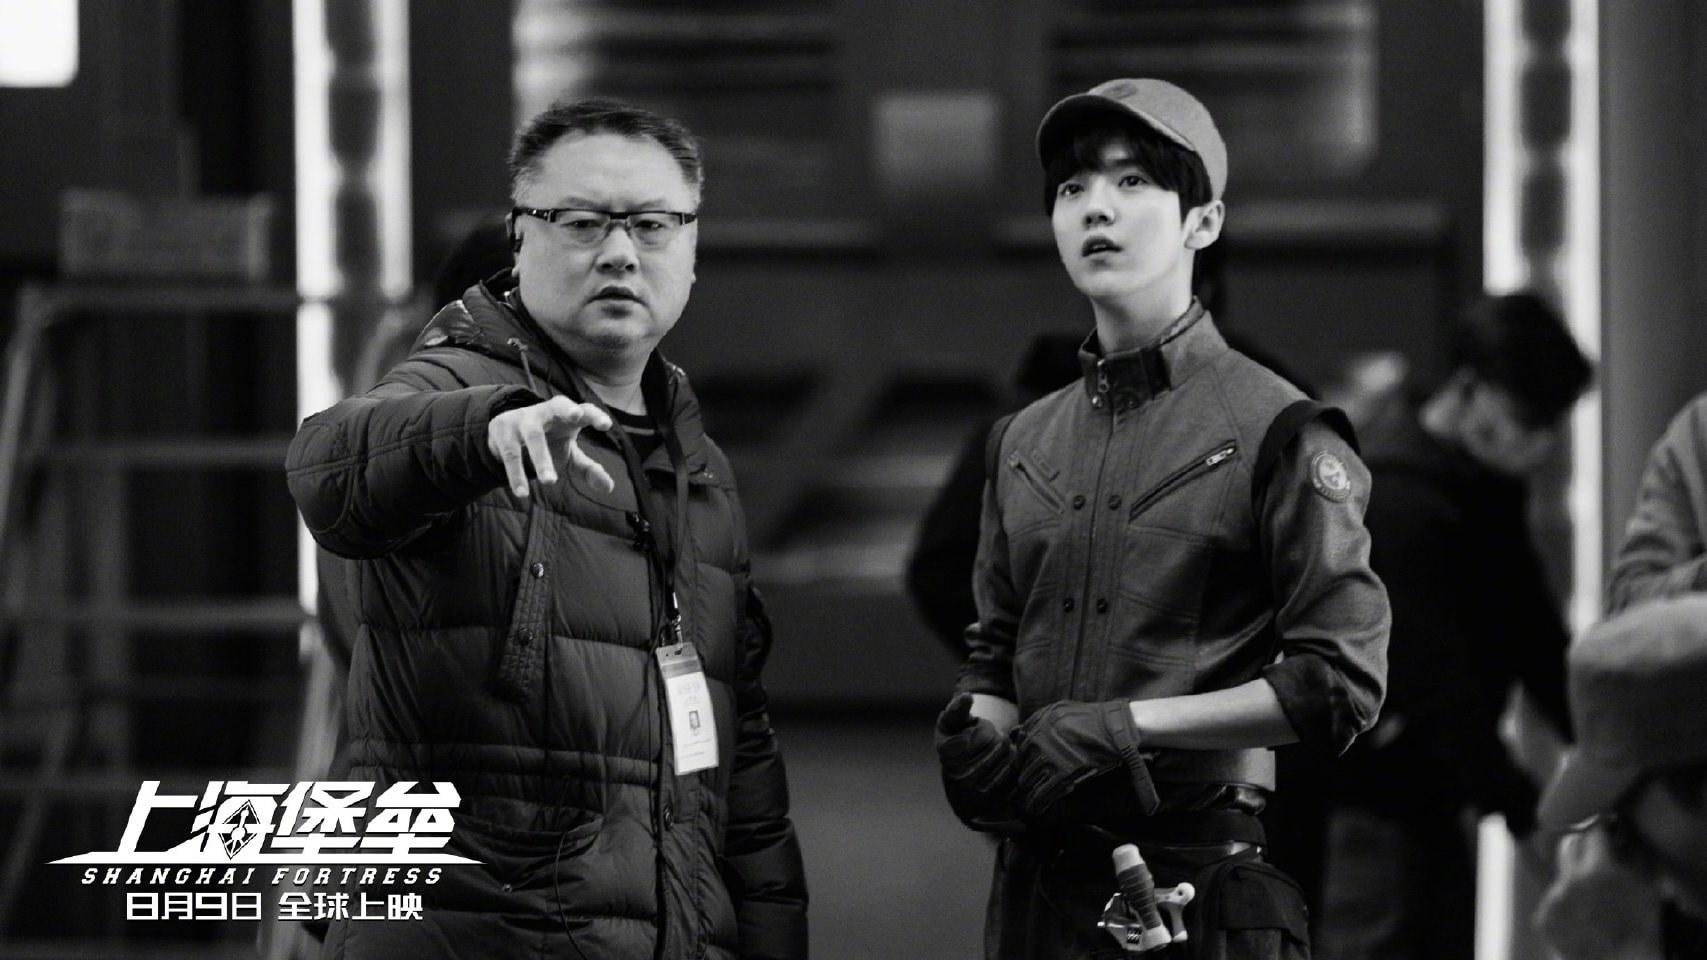 <b>江南评《上海堡垒》电影:第一次看样片时就看出它的瑕疵</b>